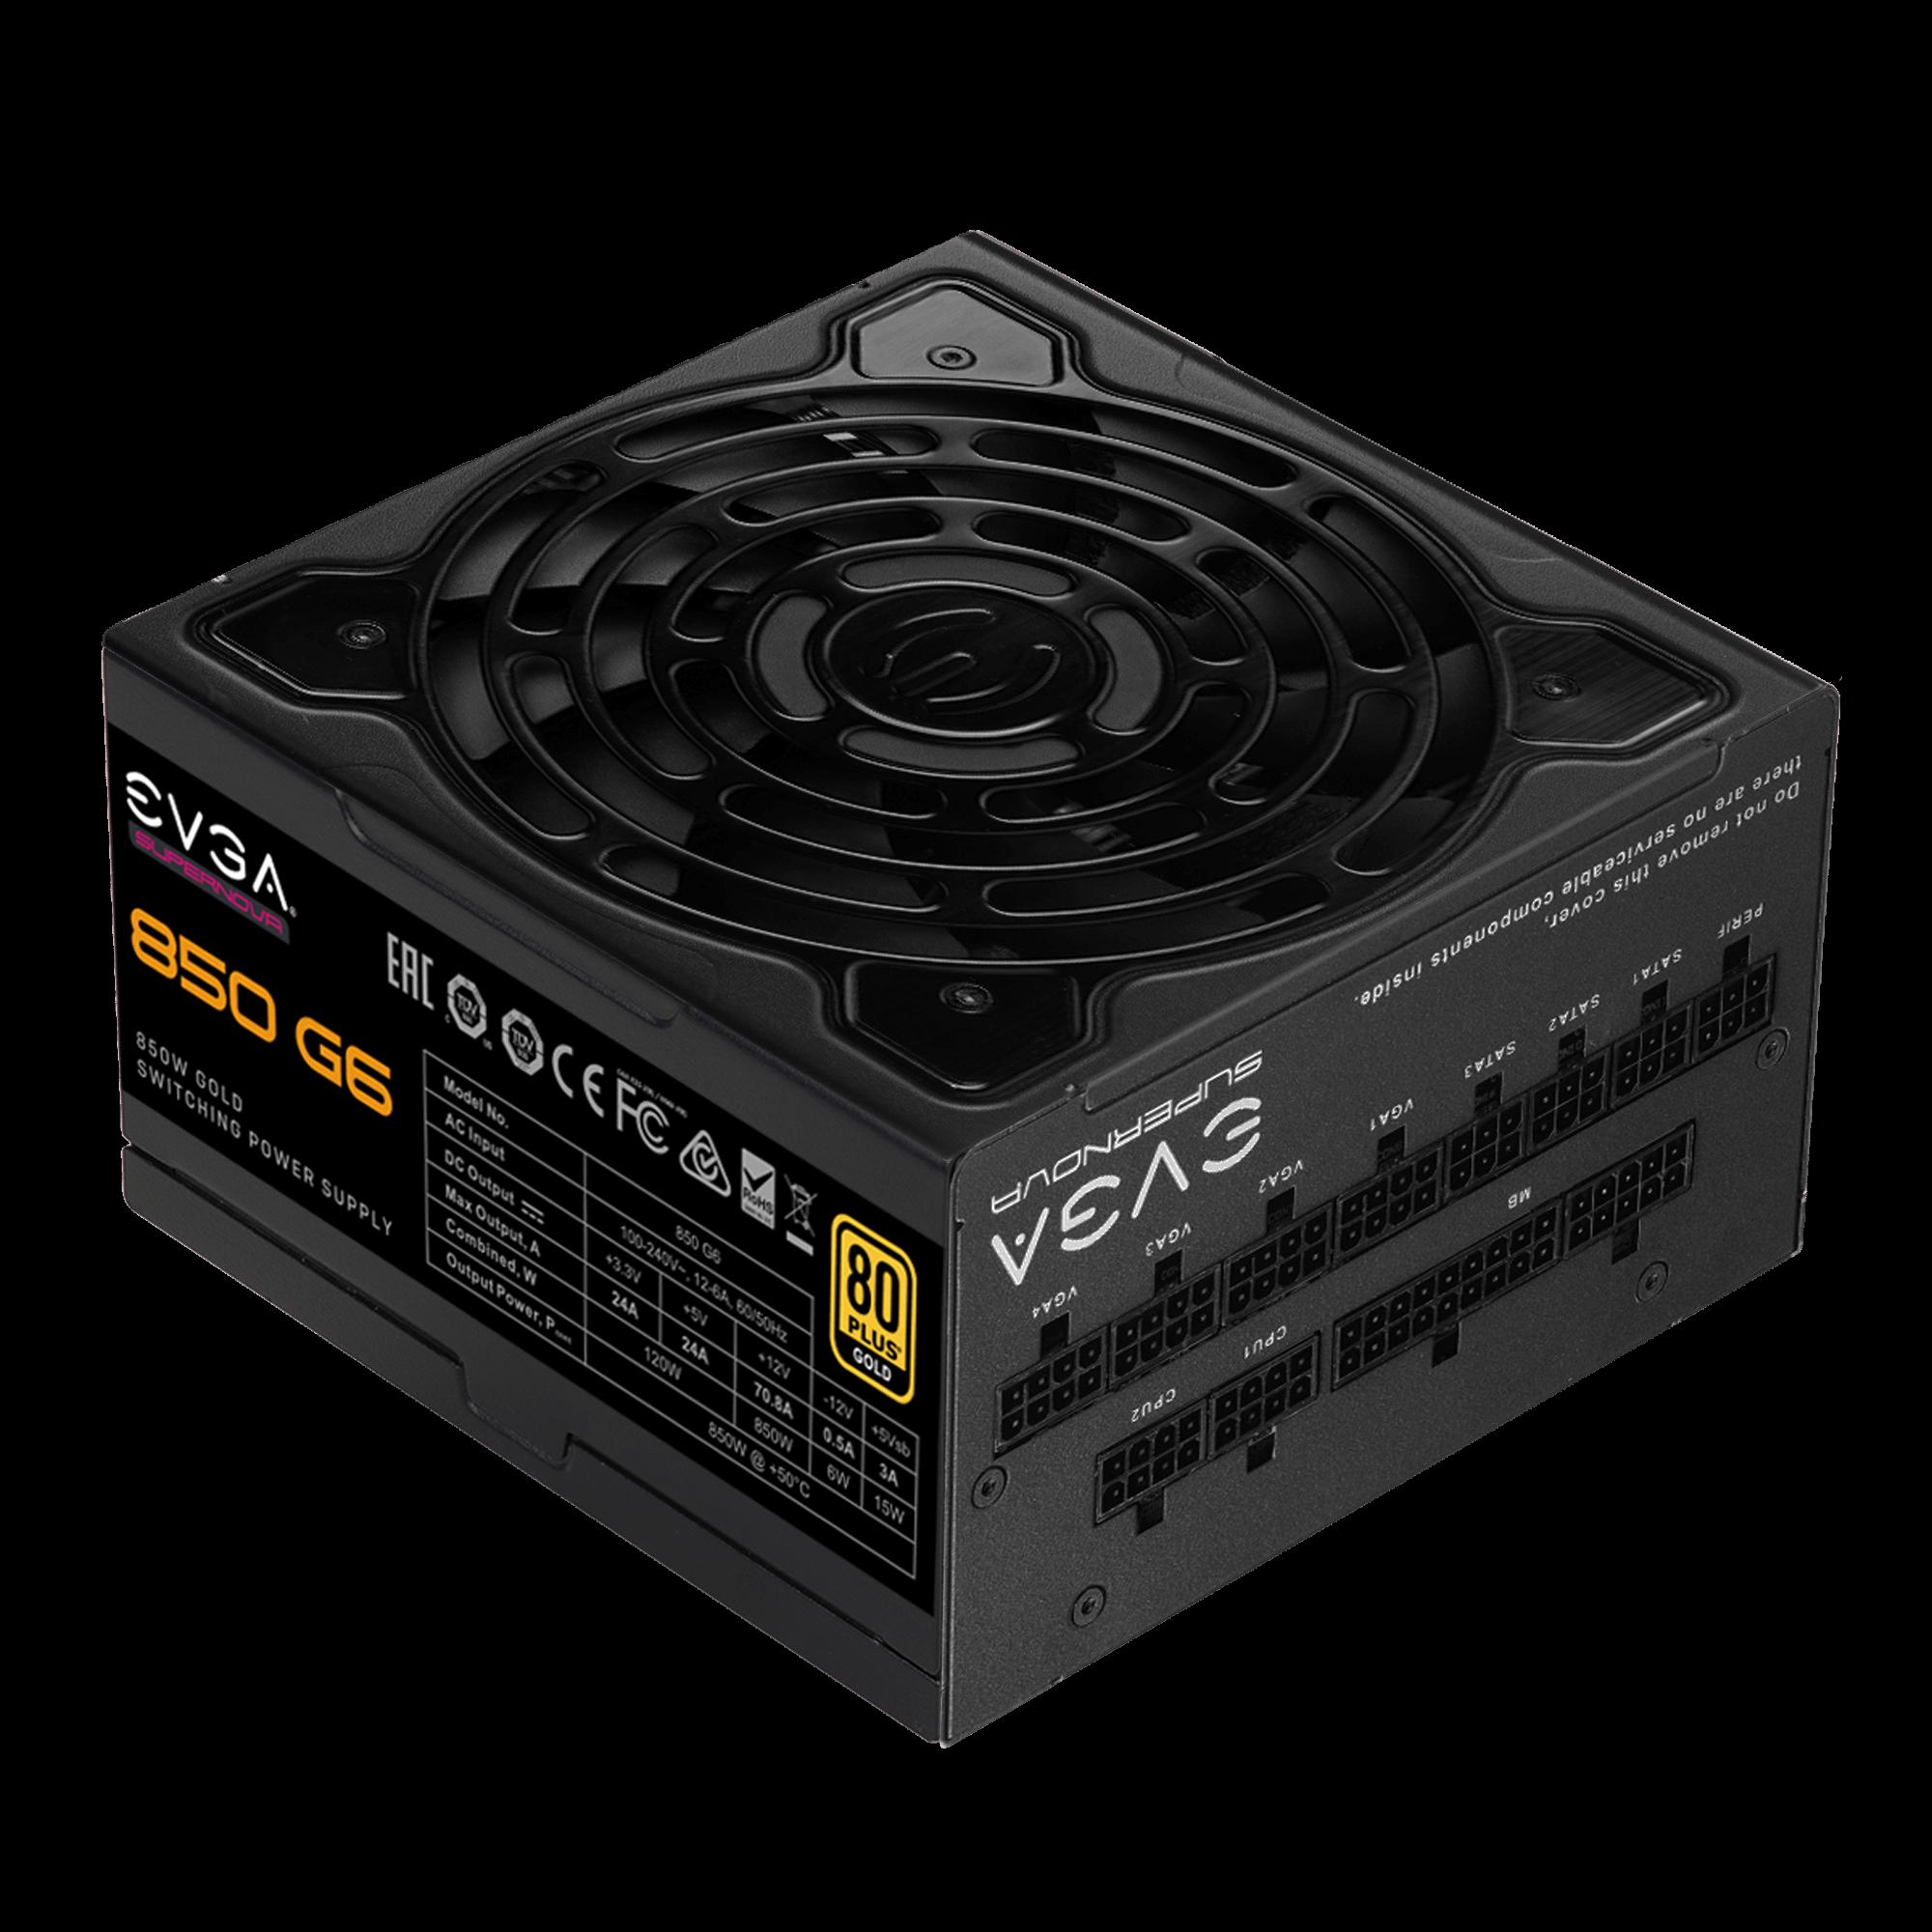 EVGA SuperNOVA 850 G6 Power Supply